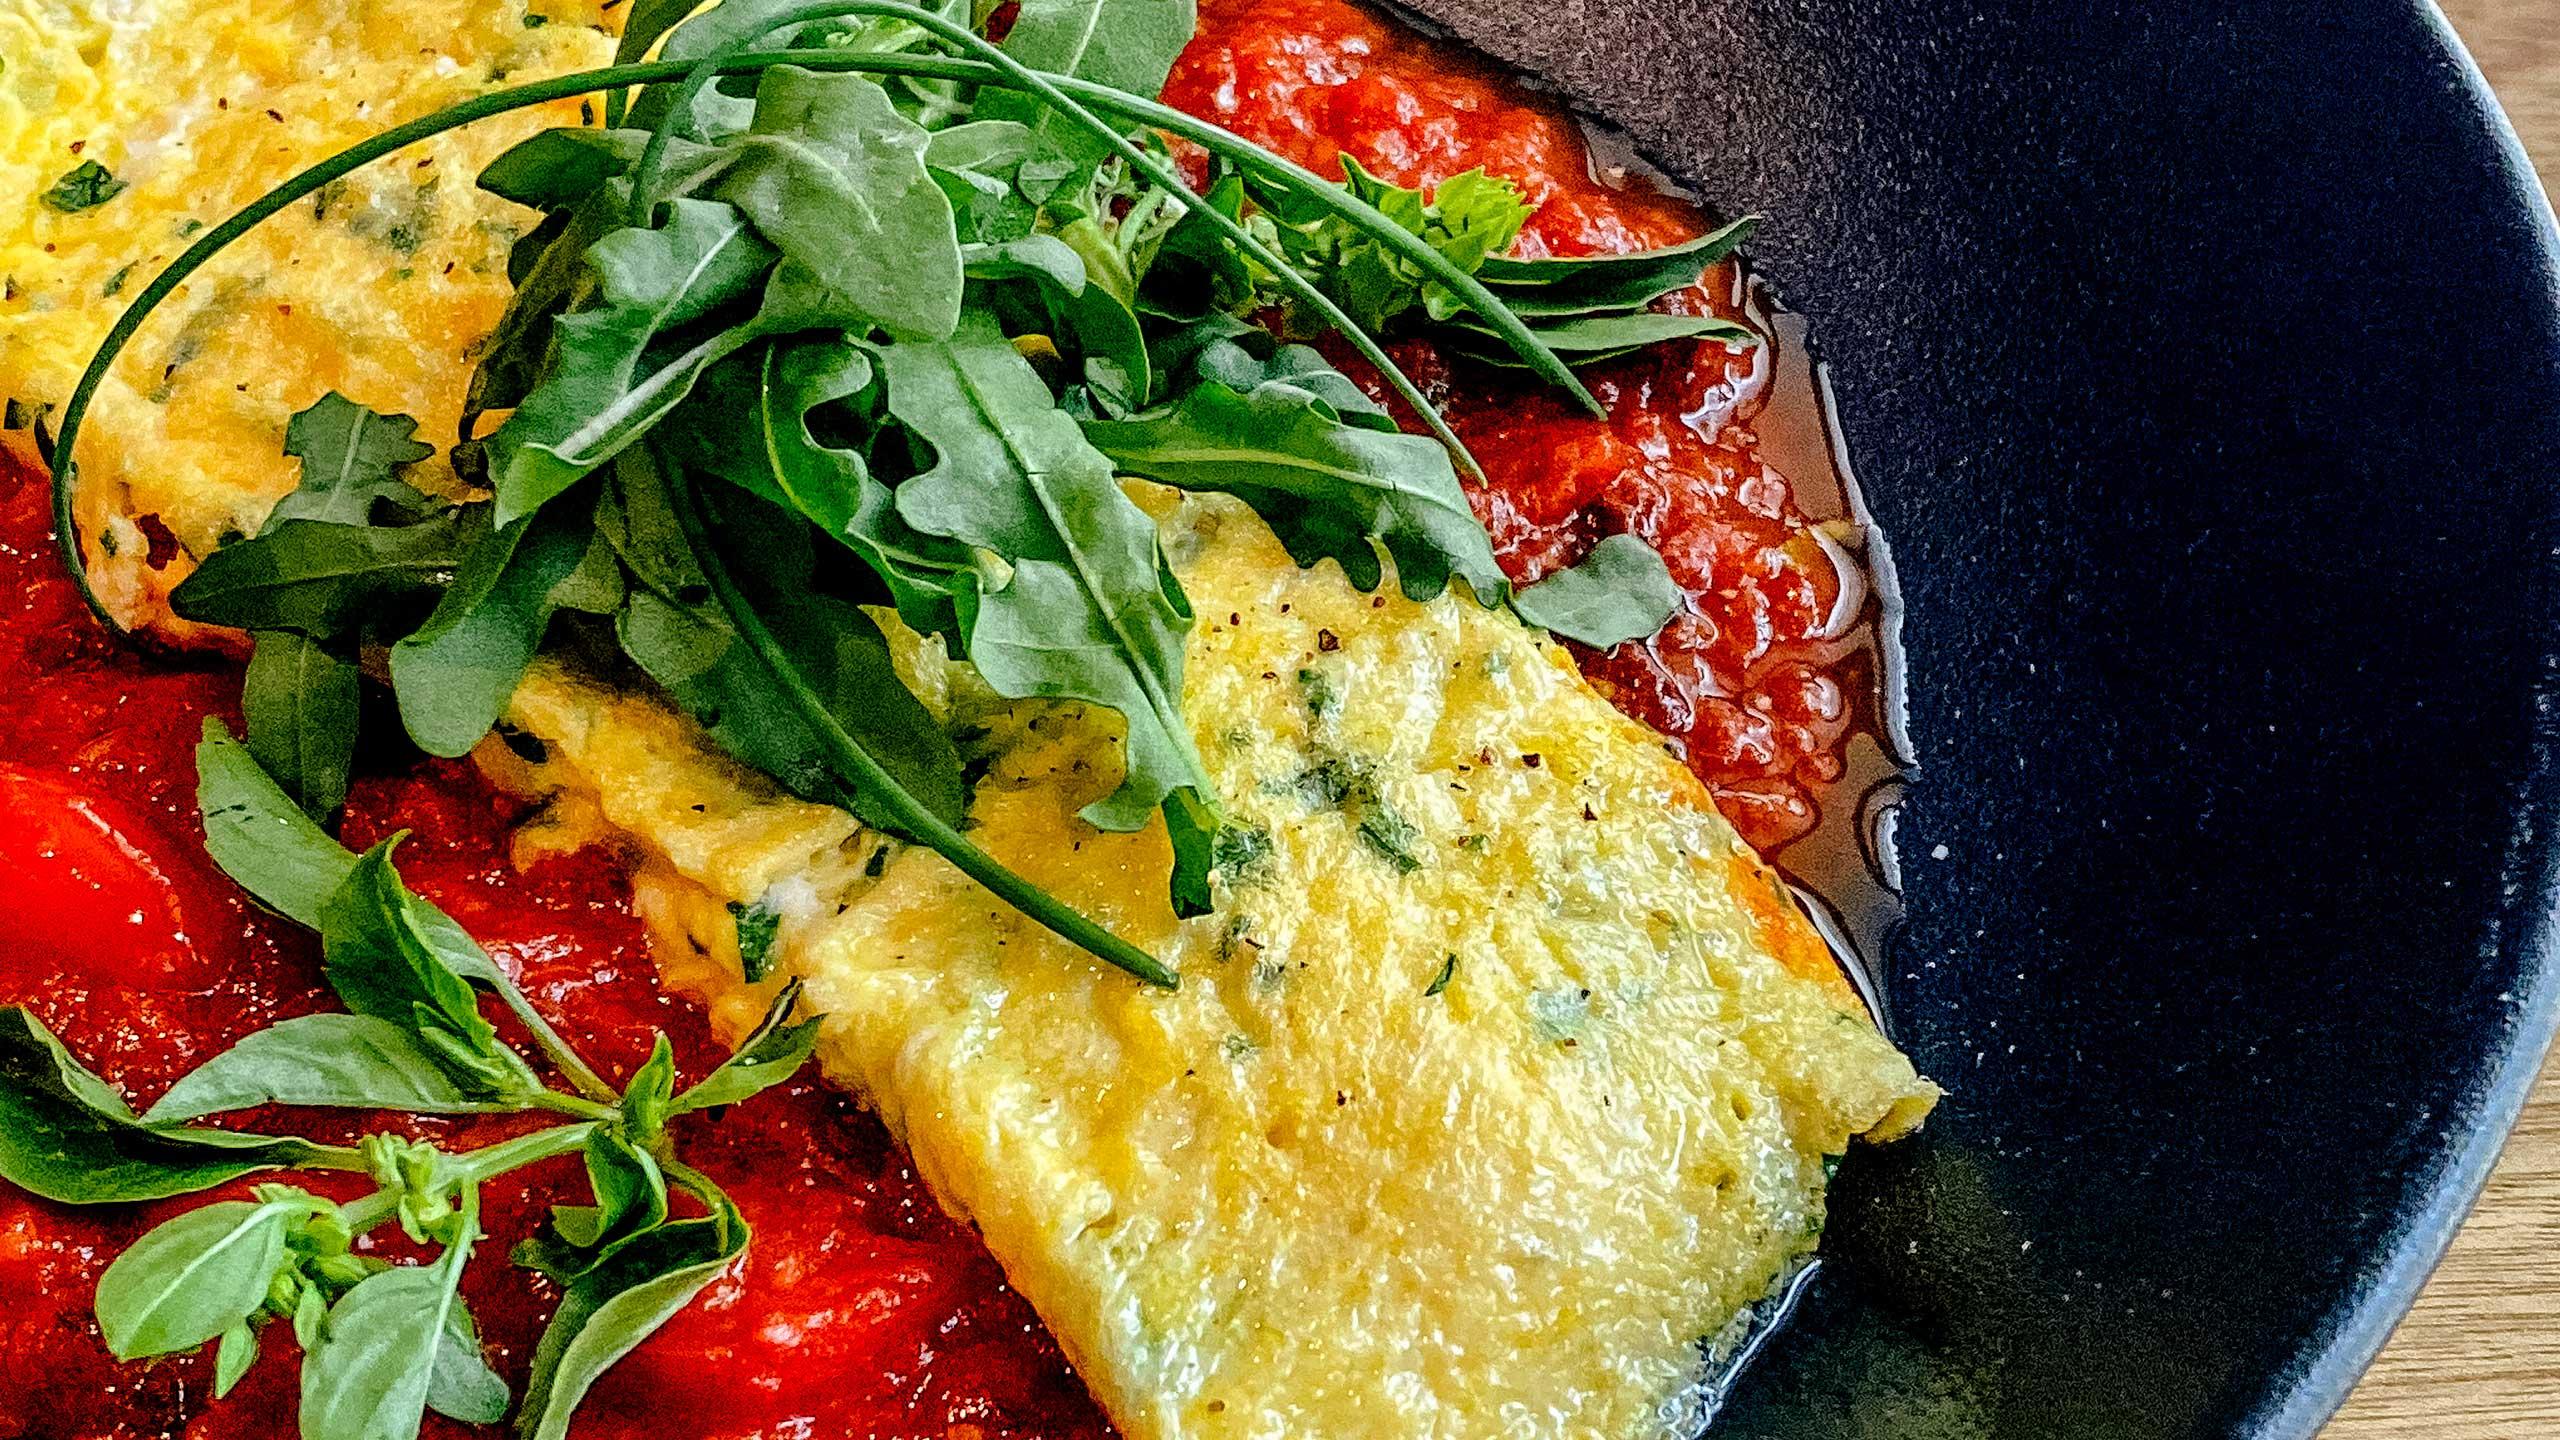 omelette, huevo, recetas con huevo